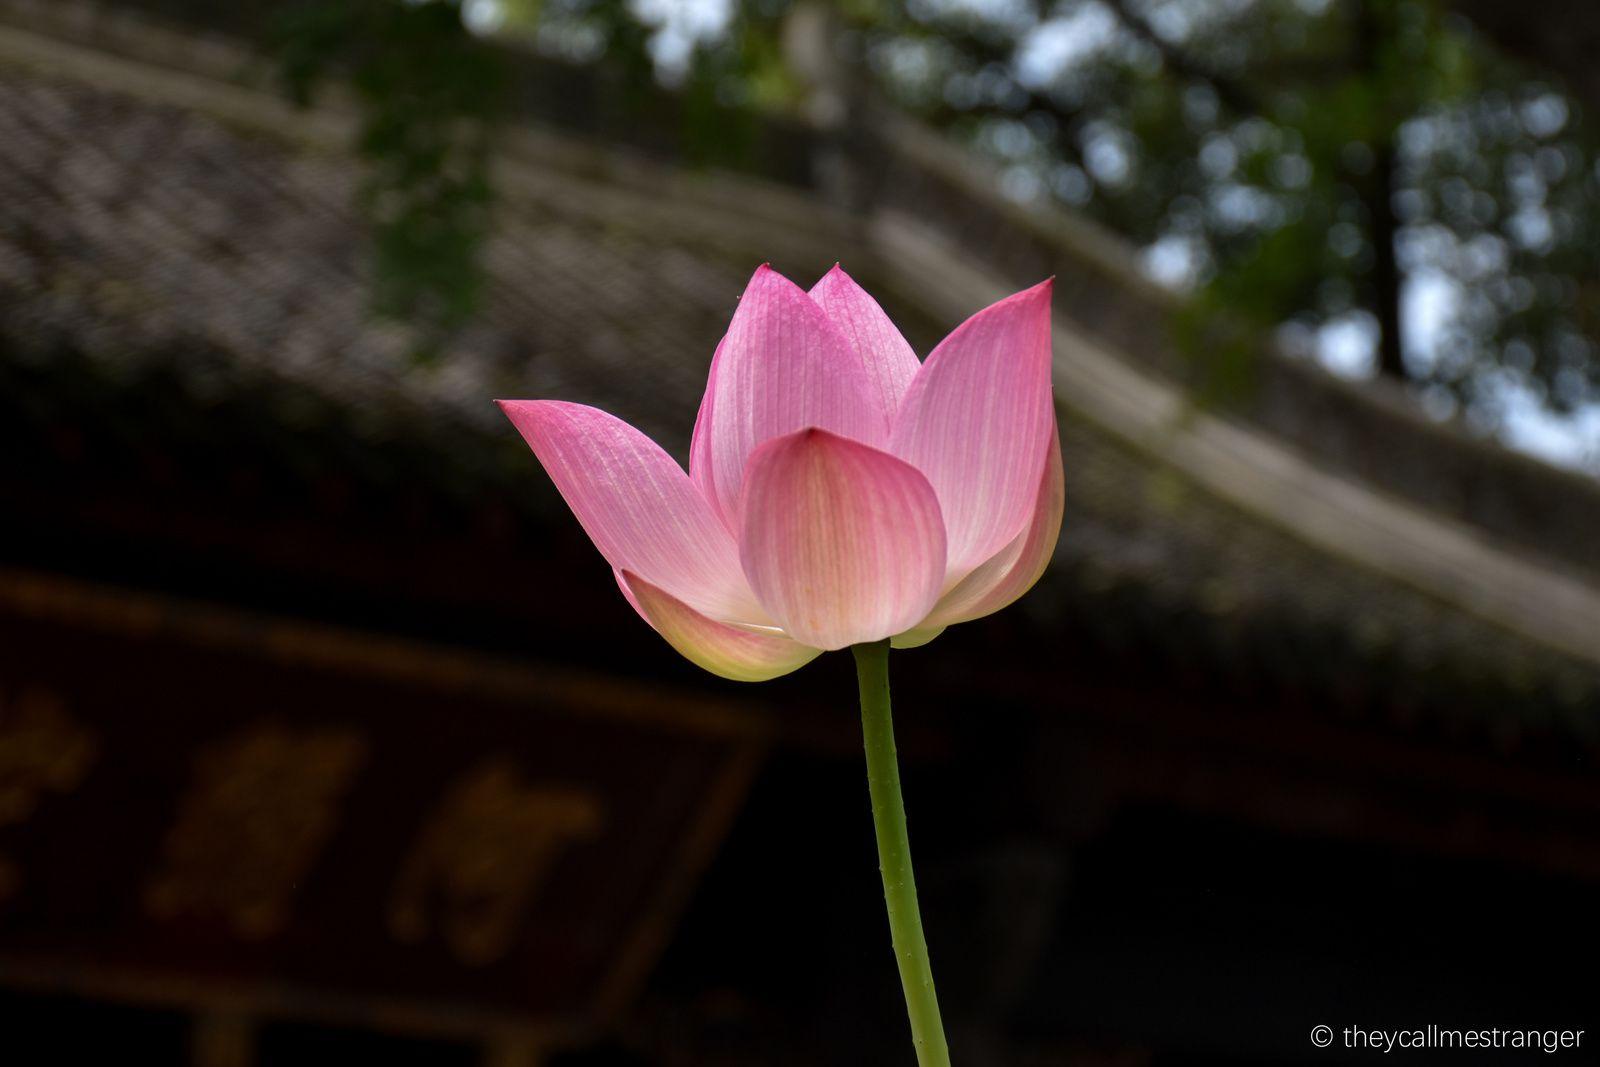 Chengdu 成都 : Le monastère bouddhiste Wenshu 文殊院